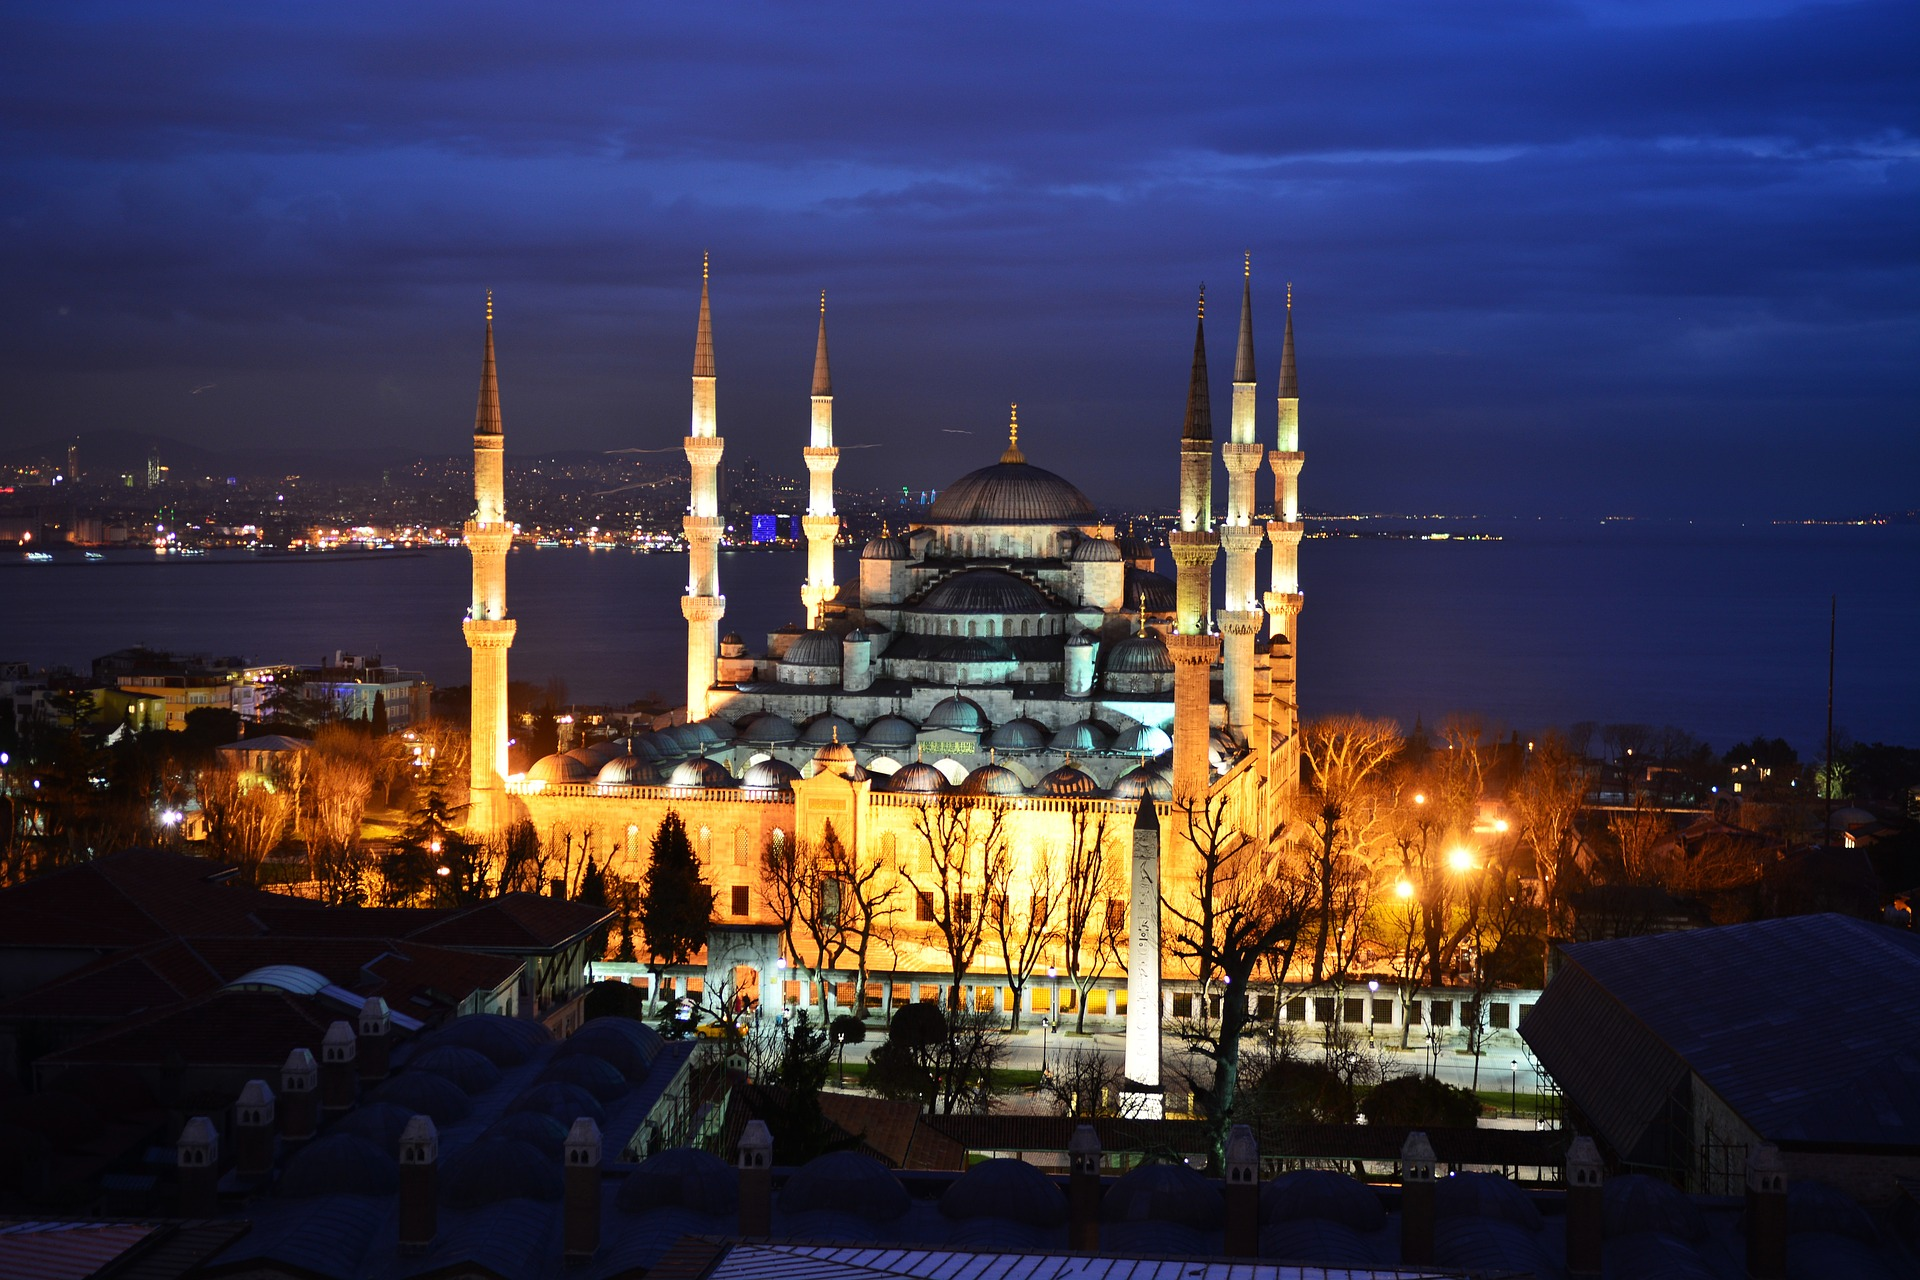 blue-mosque-908510_1920